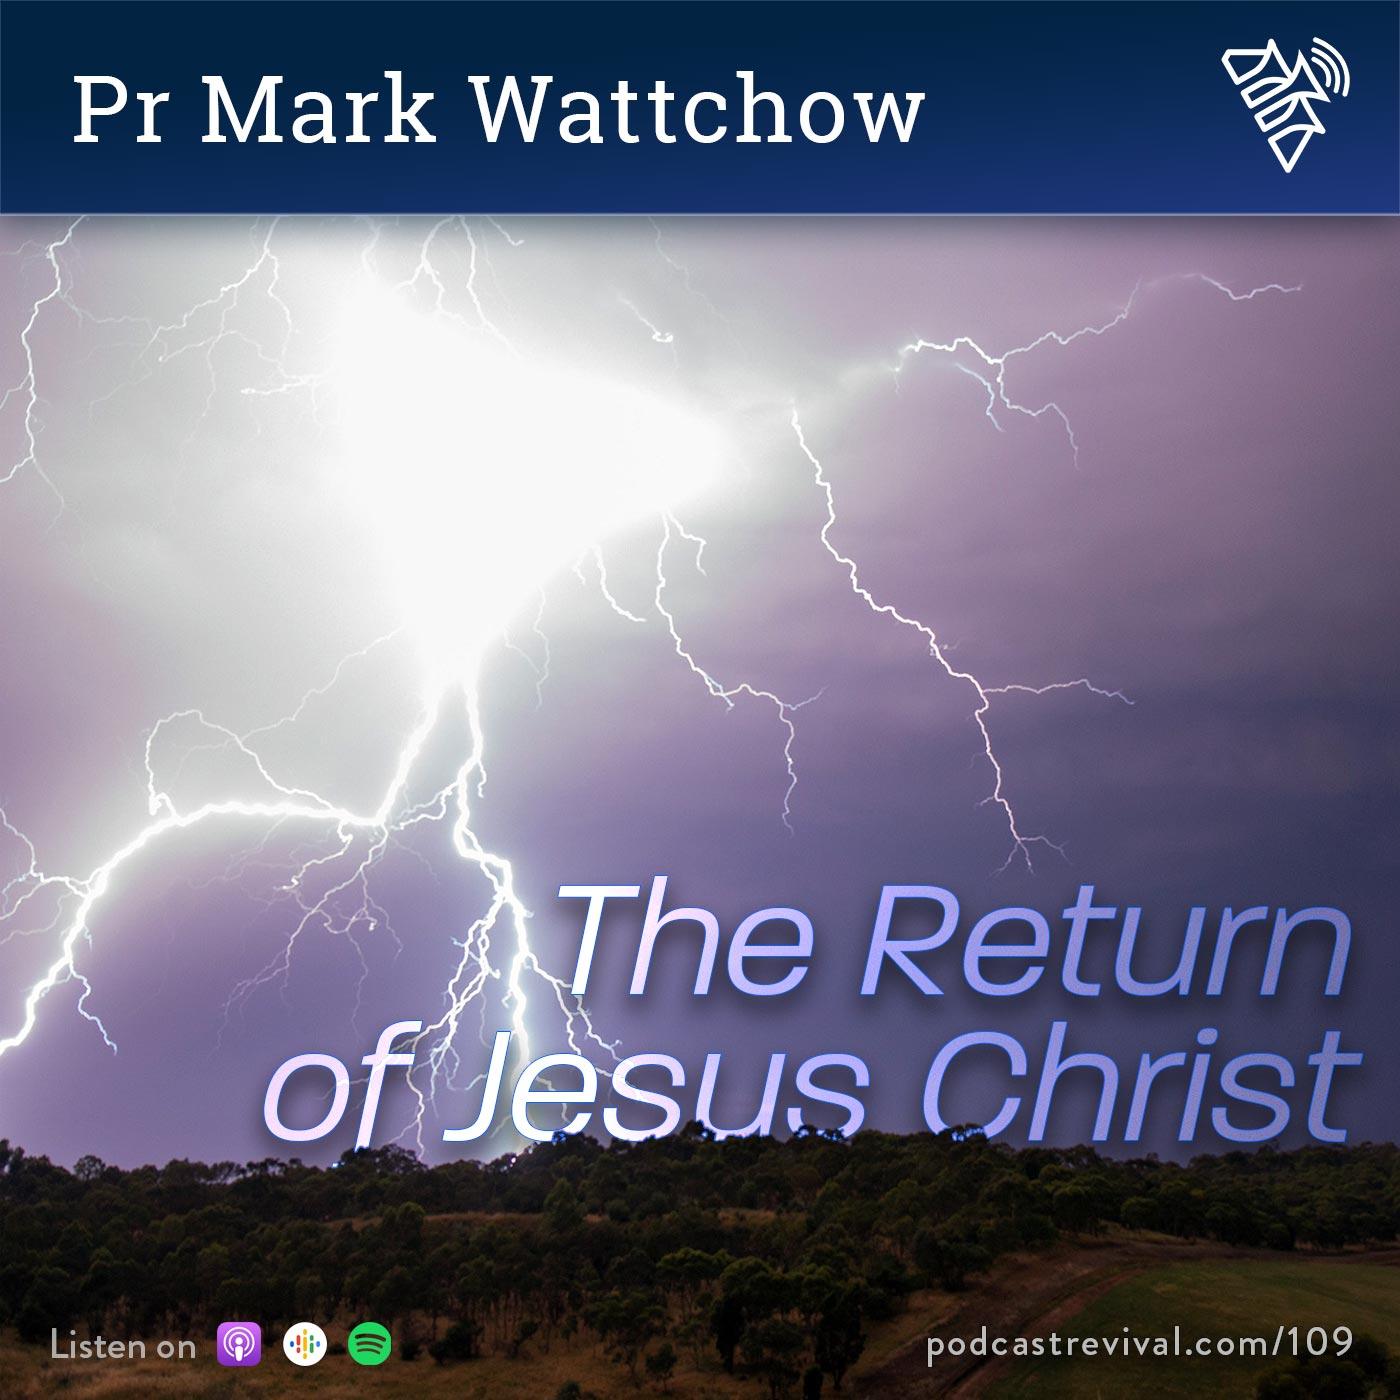 The return of Jesus Christ